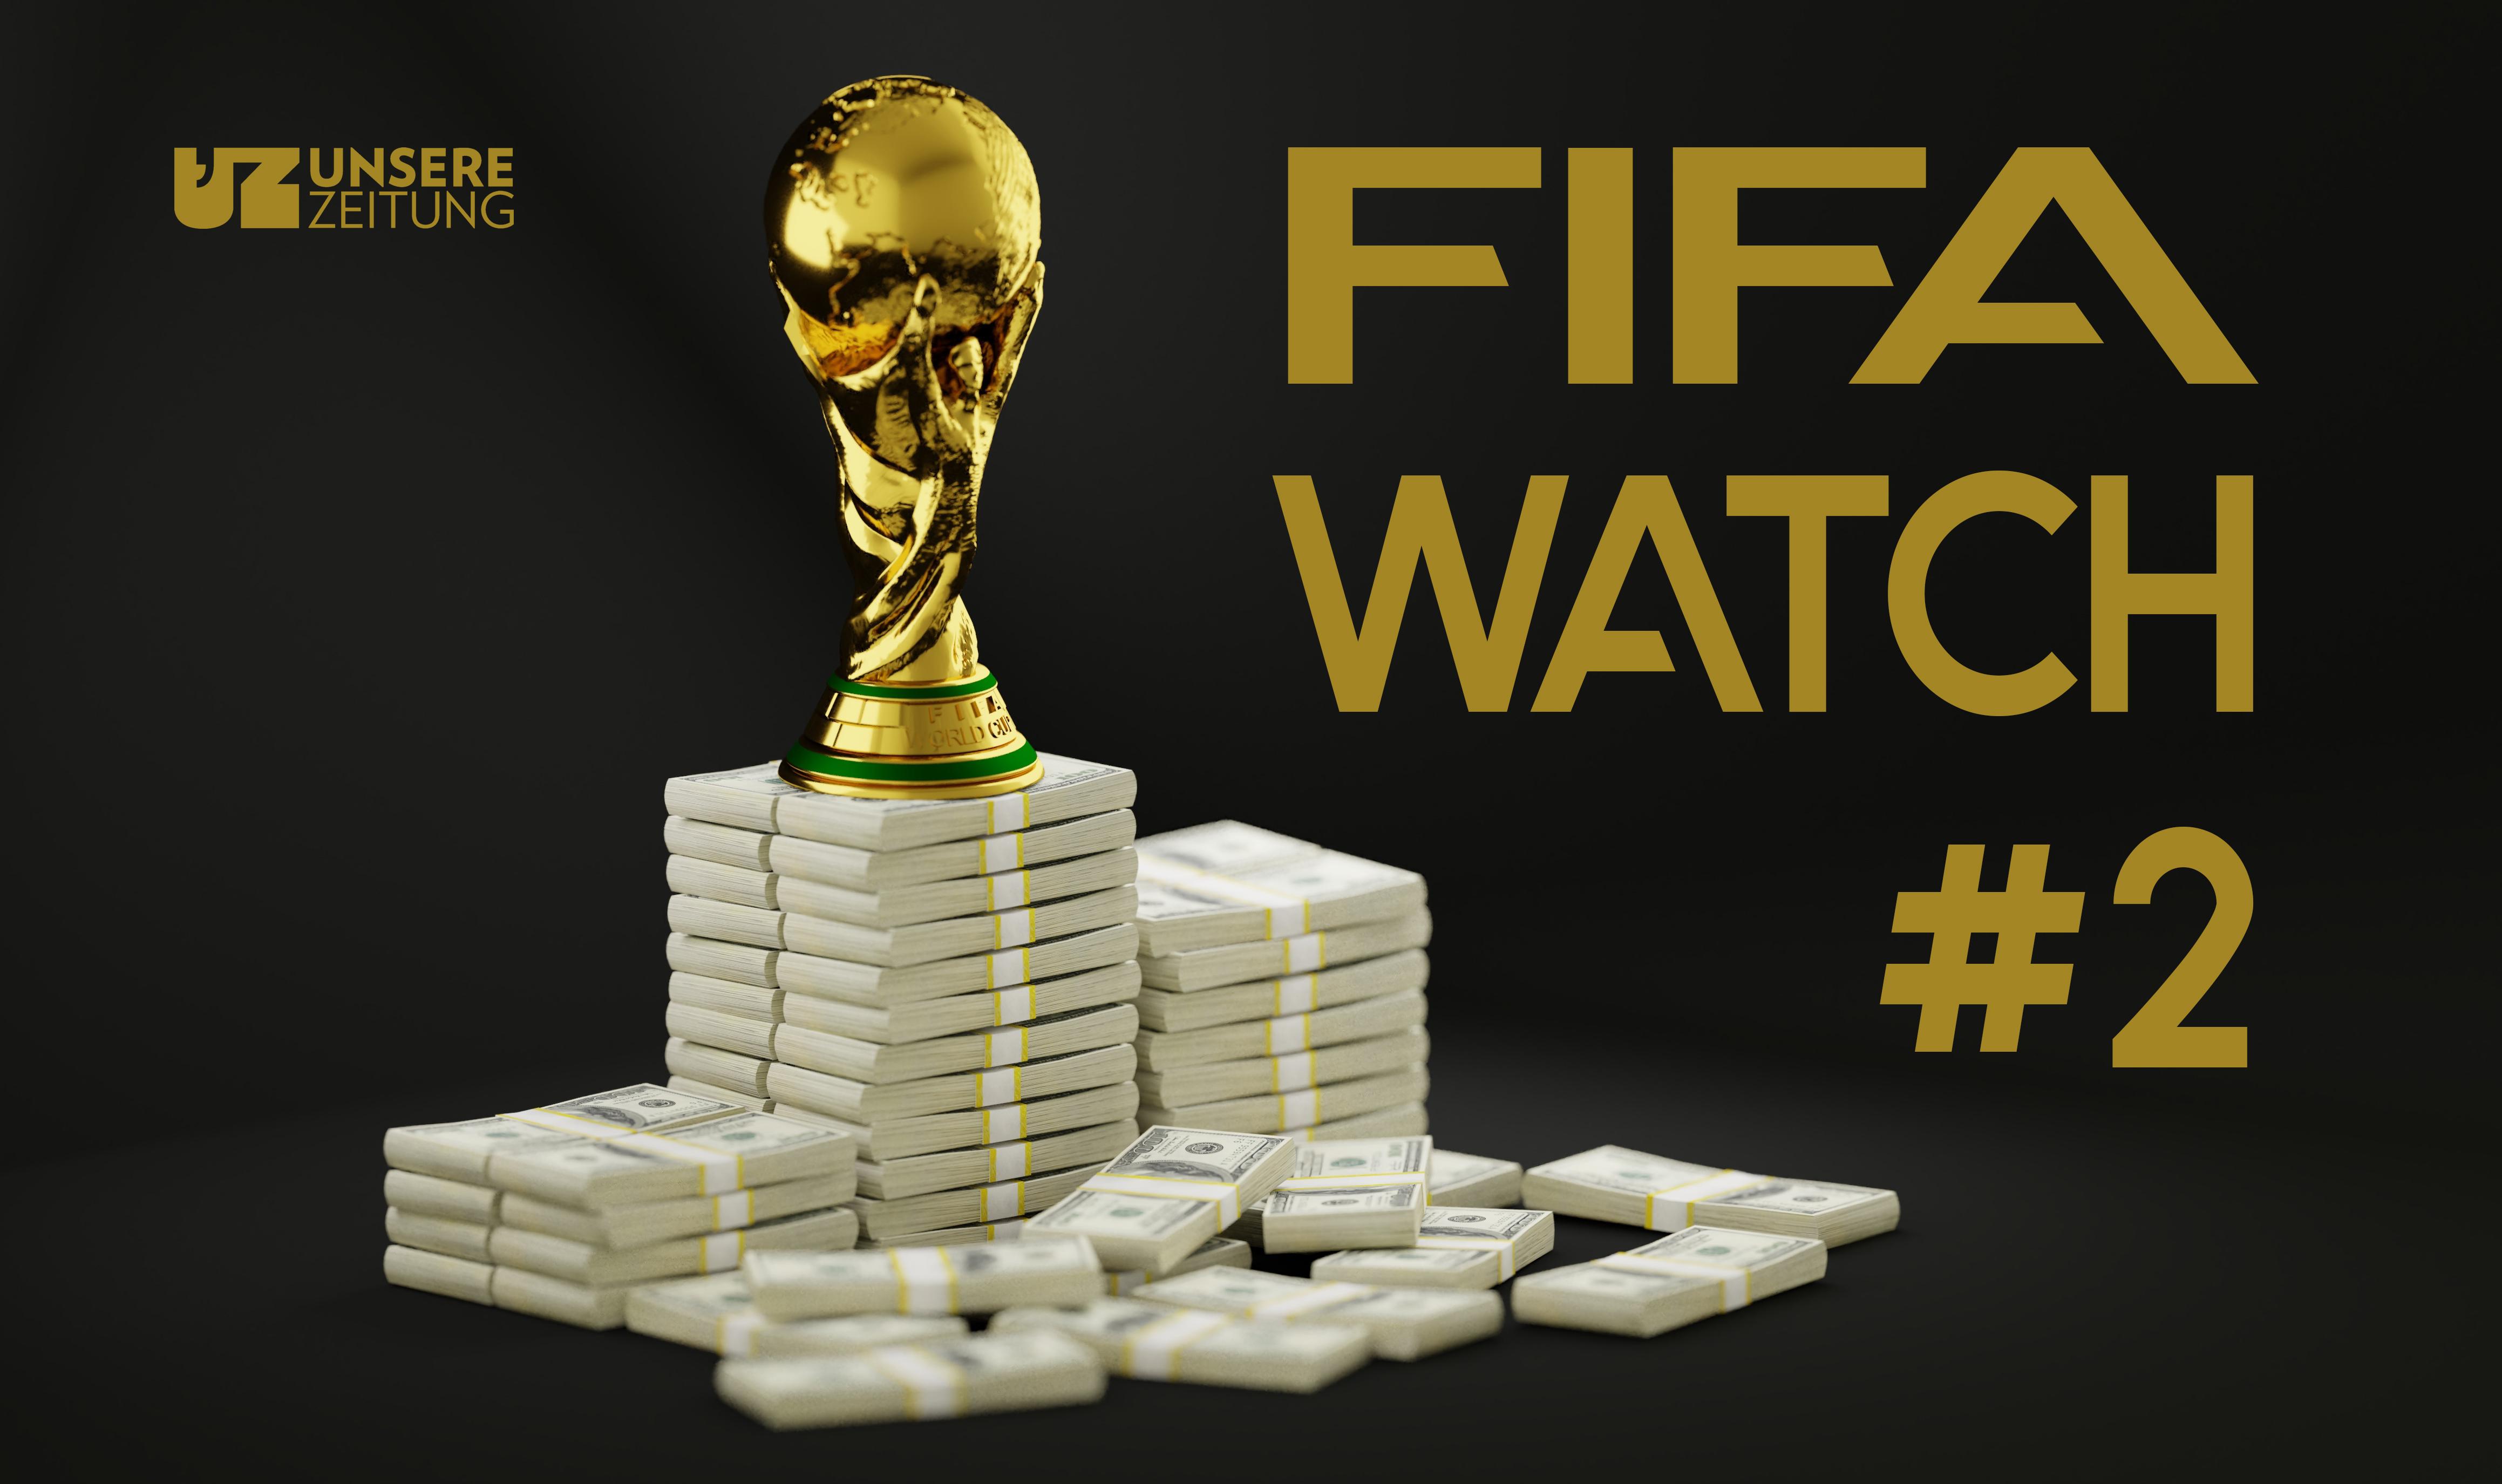 FIFA WATCH #2